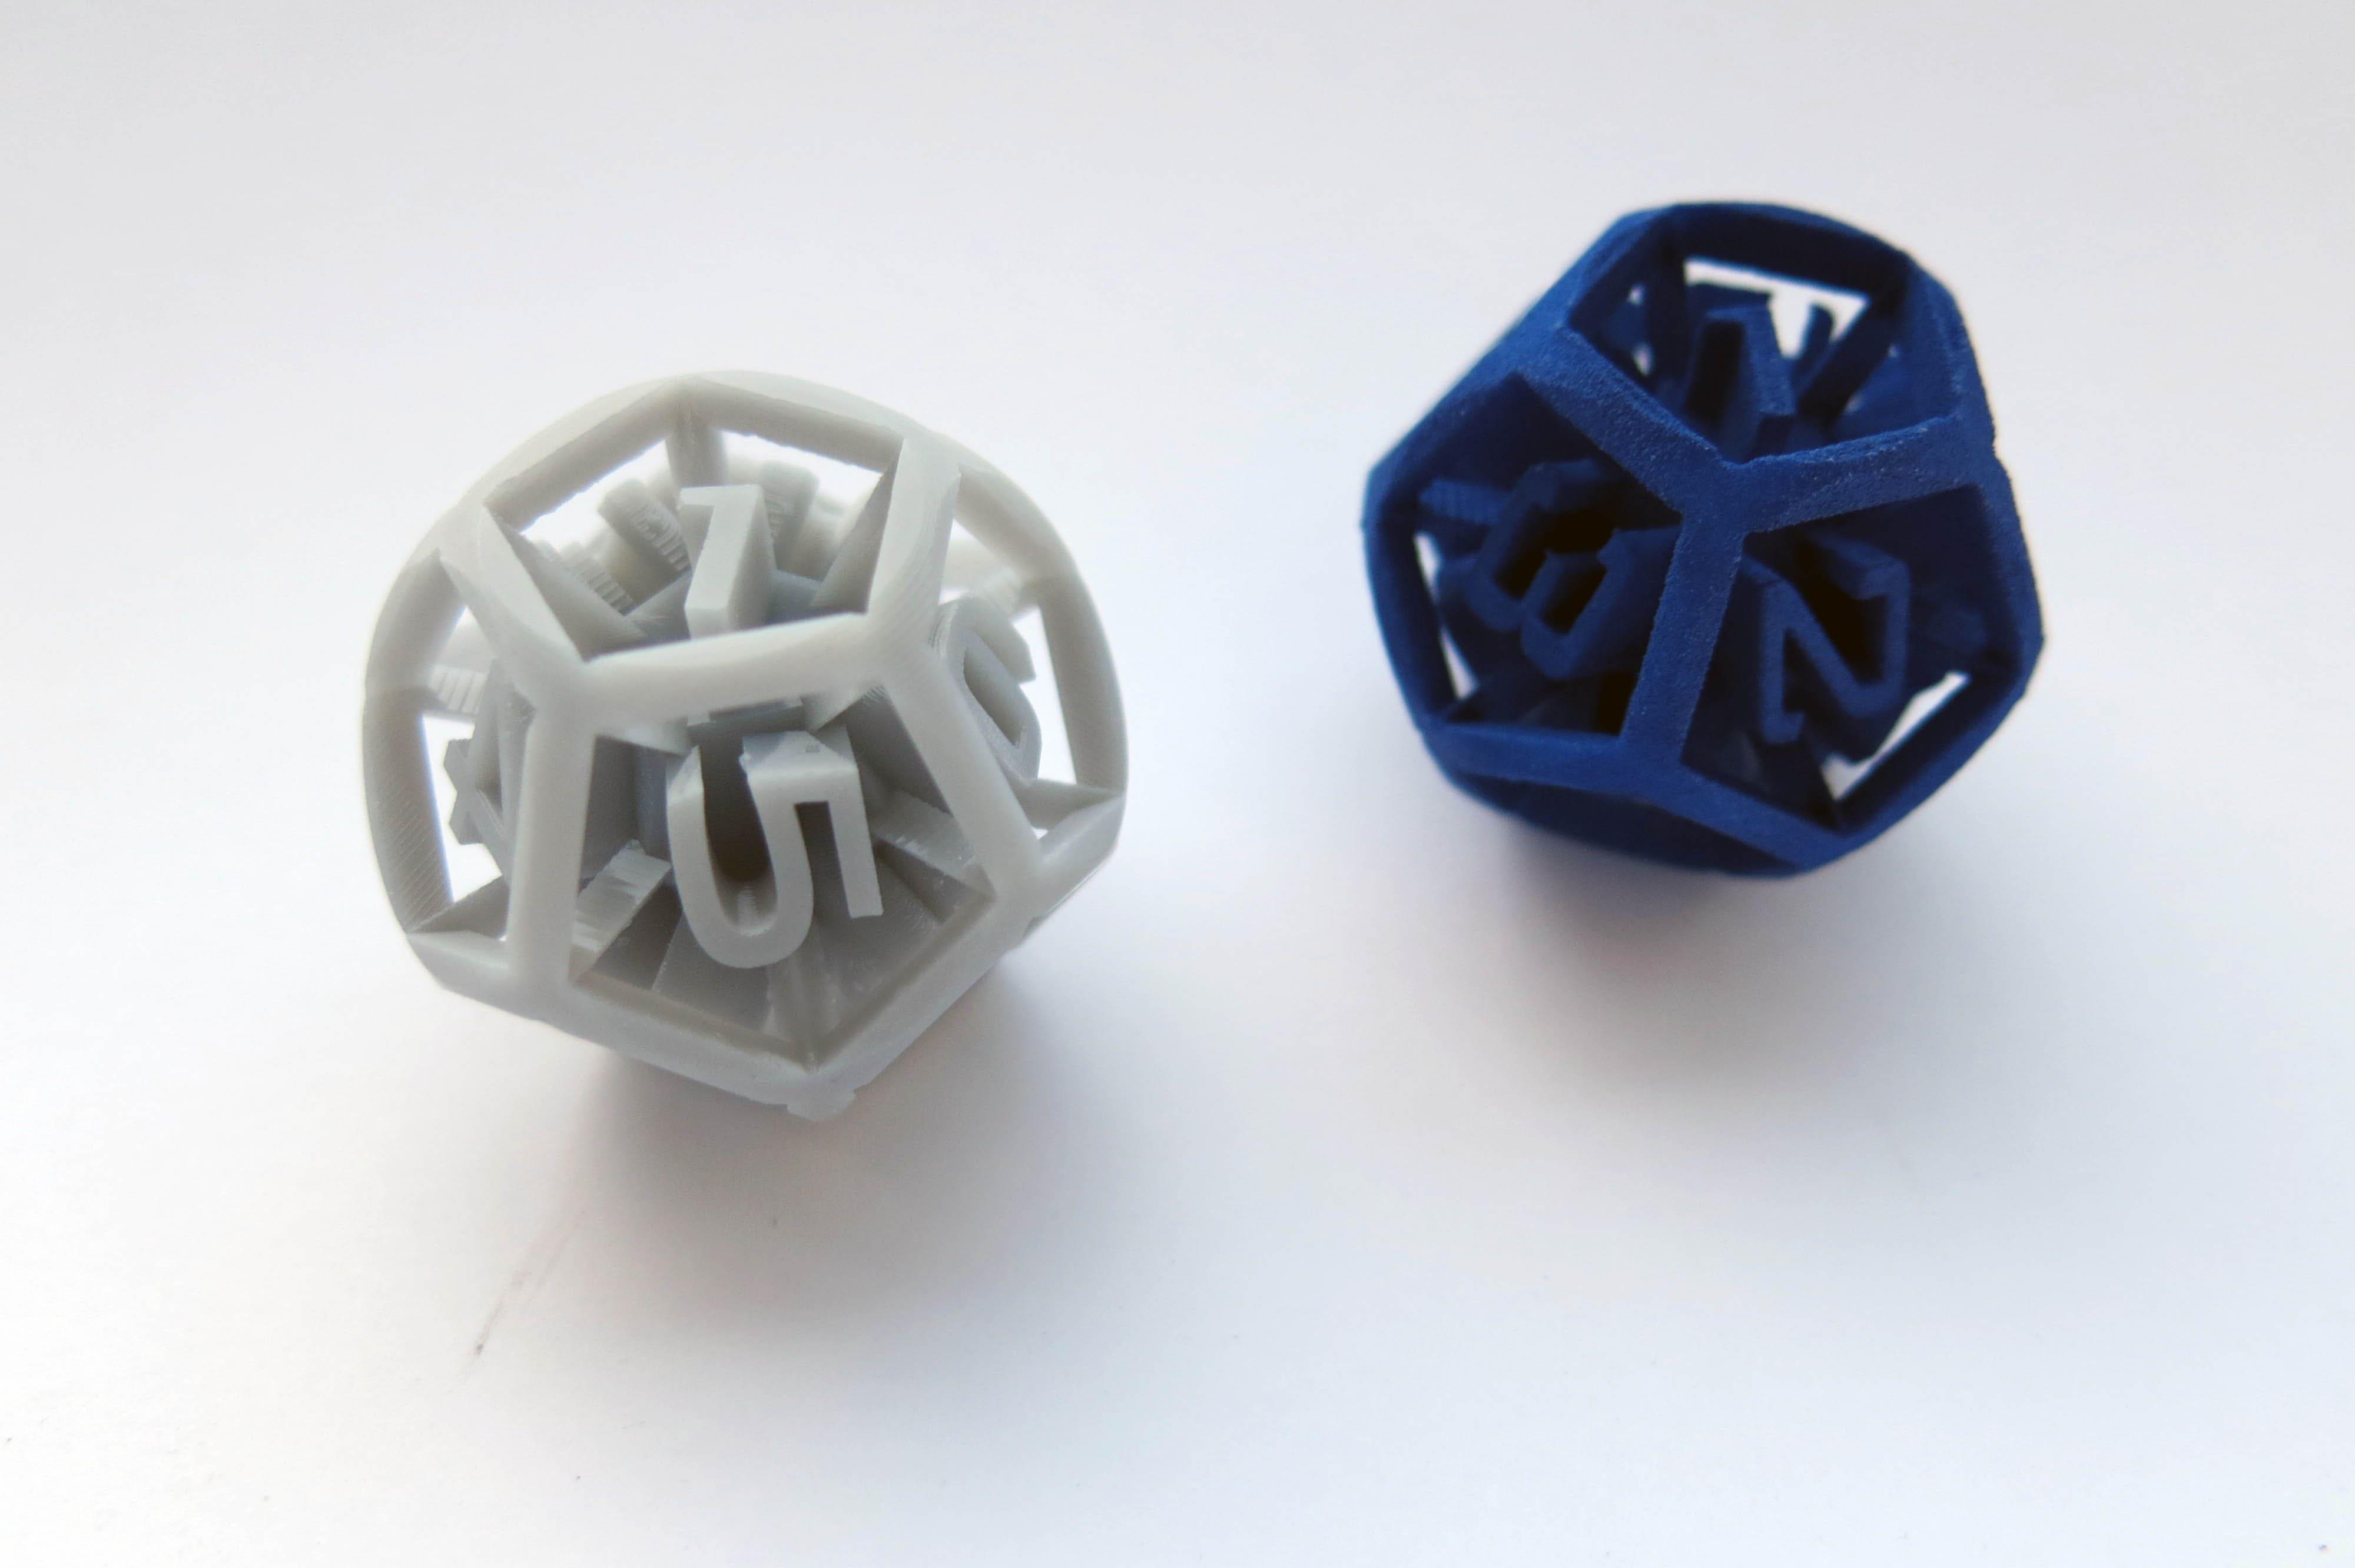 3D printing technologies: SLA vs SLS